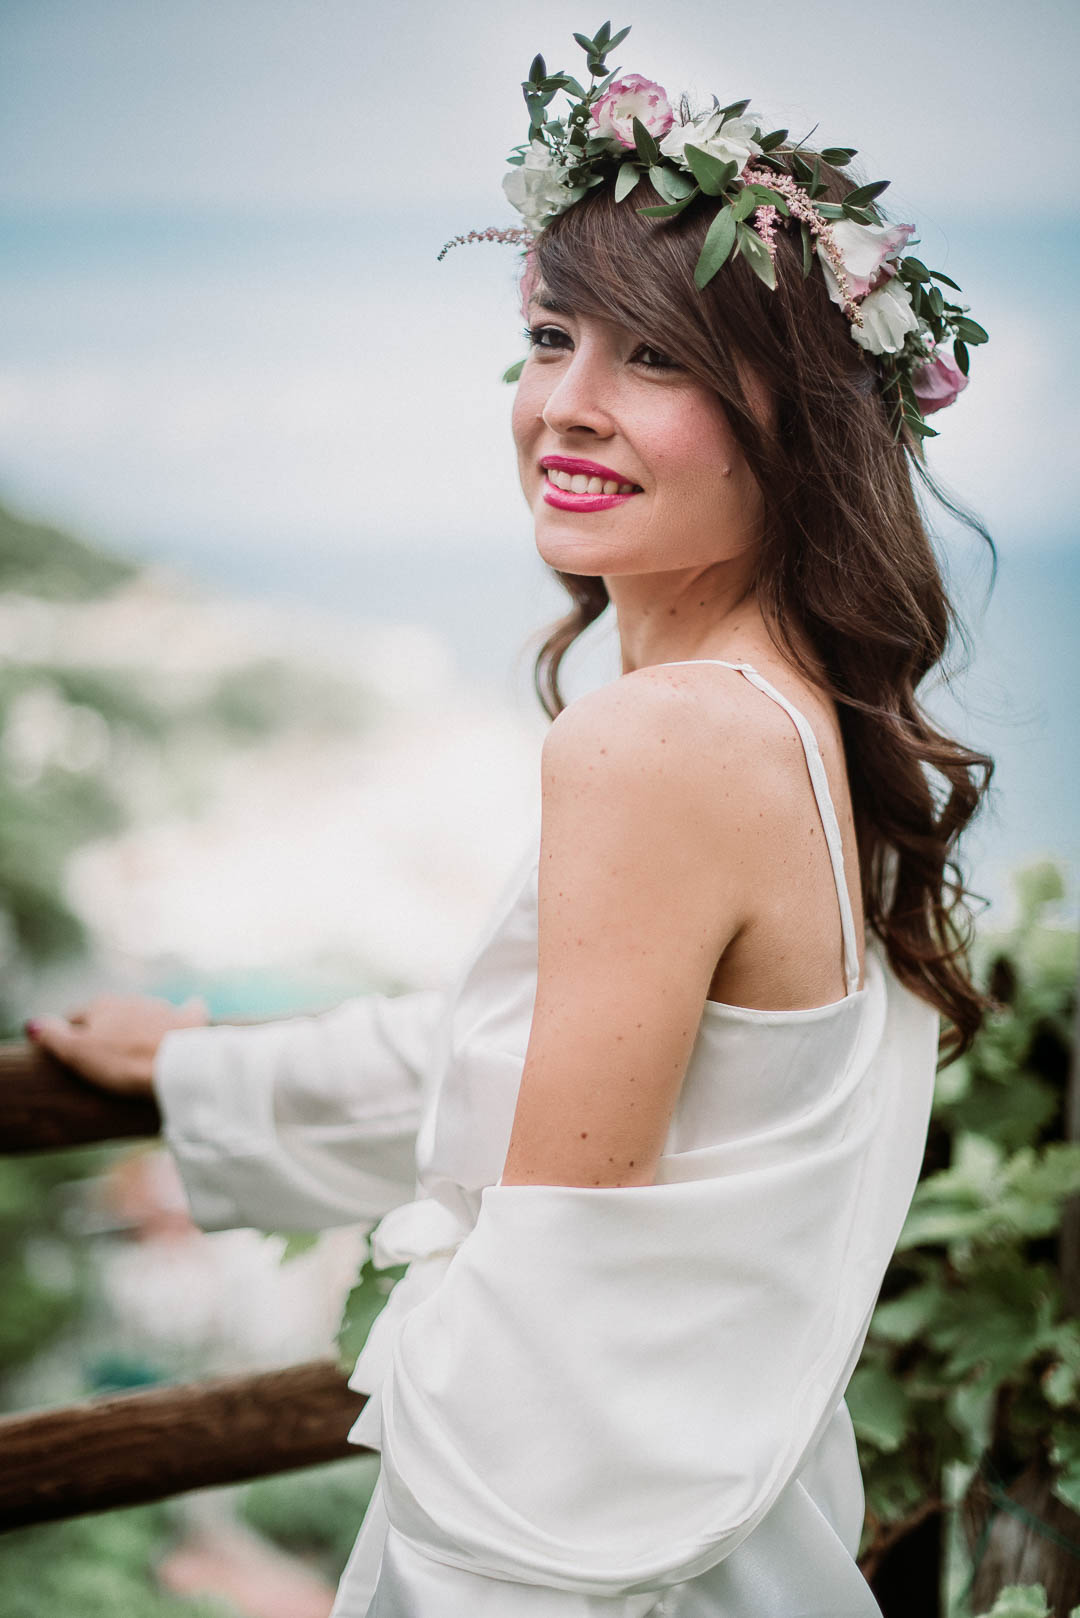 wedding-photographer-destination-fineart-bespoke-reportage-amalficoast-torrelacerniola-vivianeizzo-spazio46-32